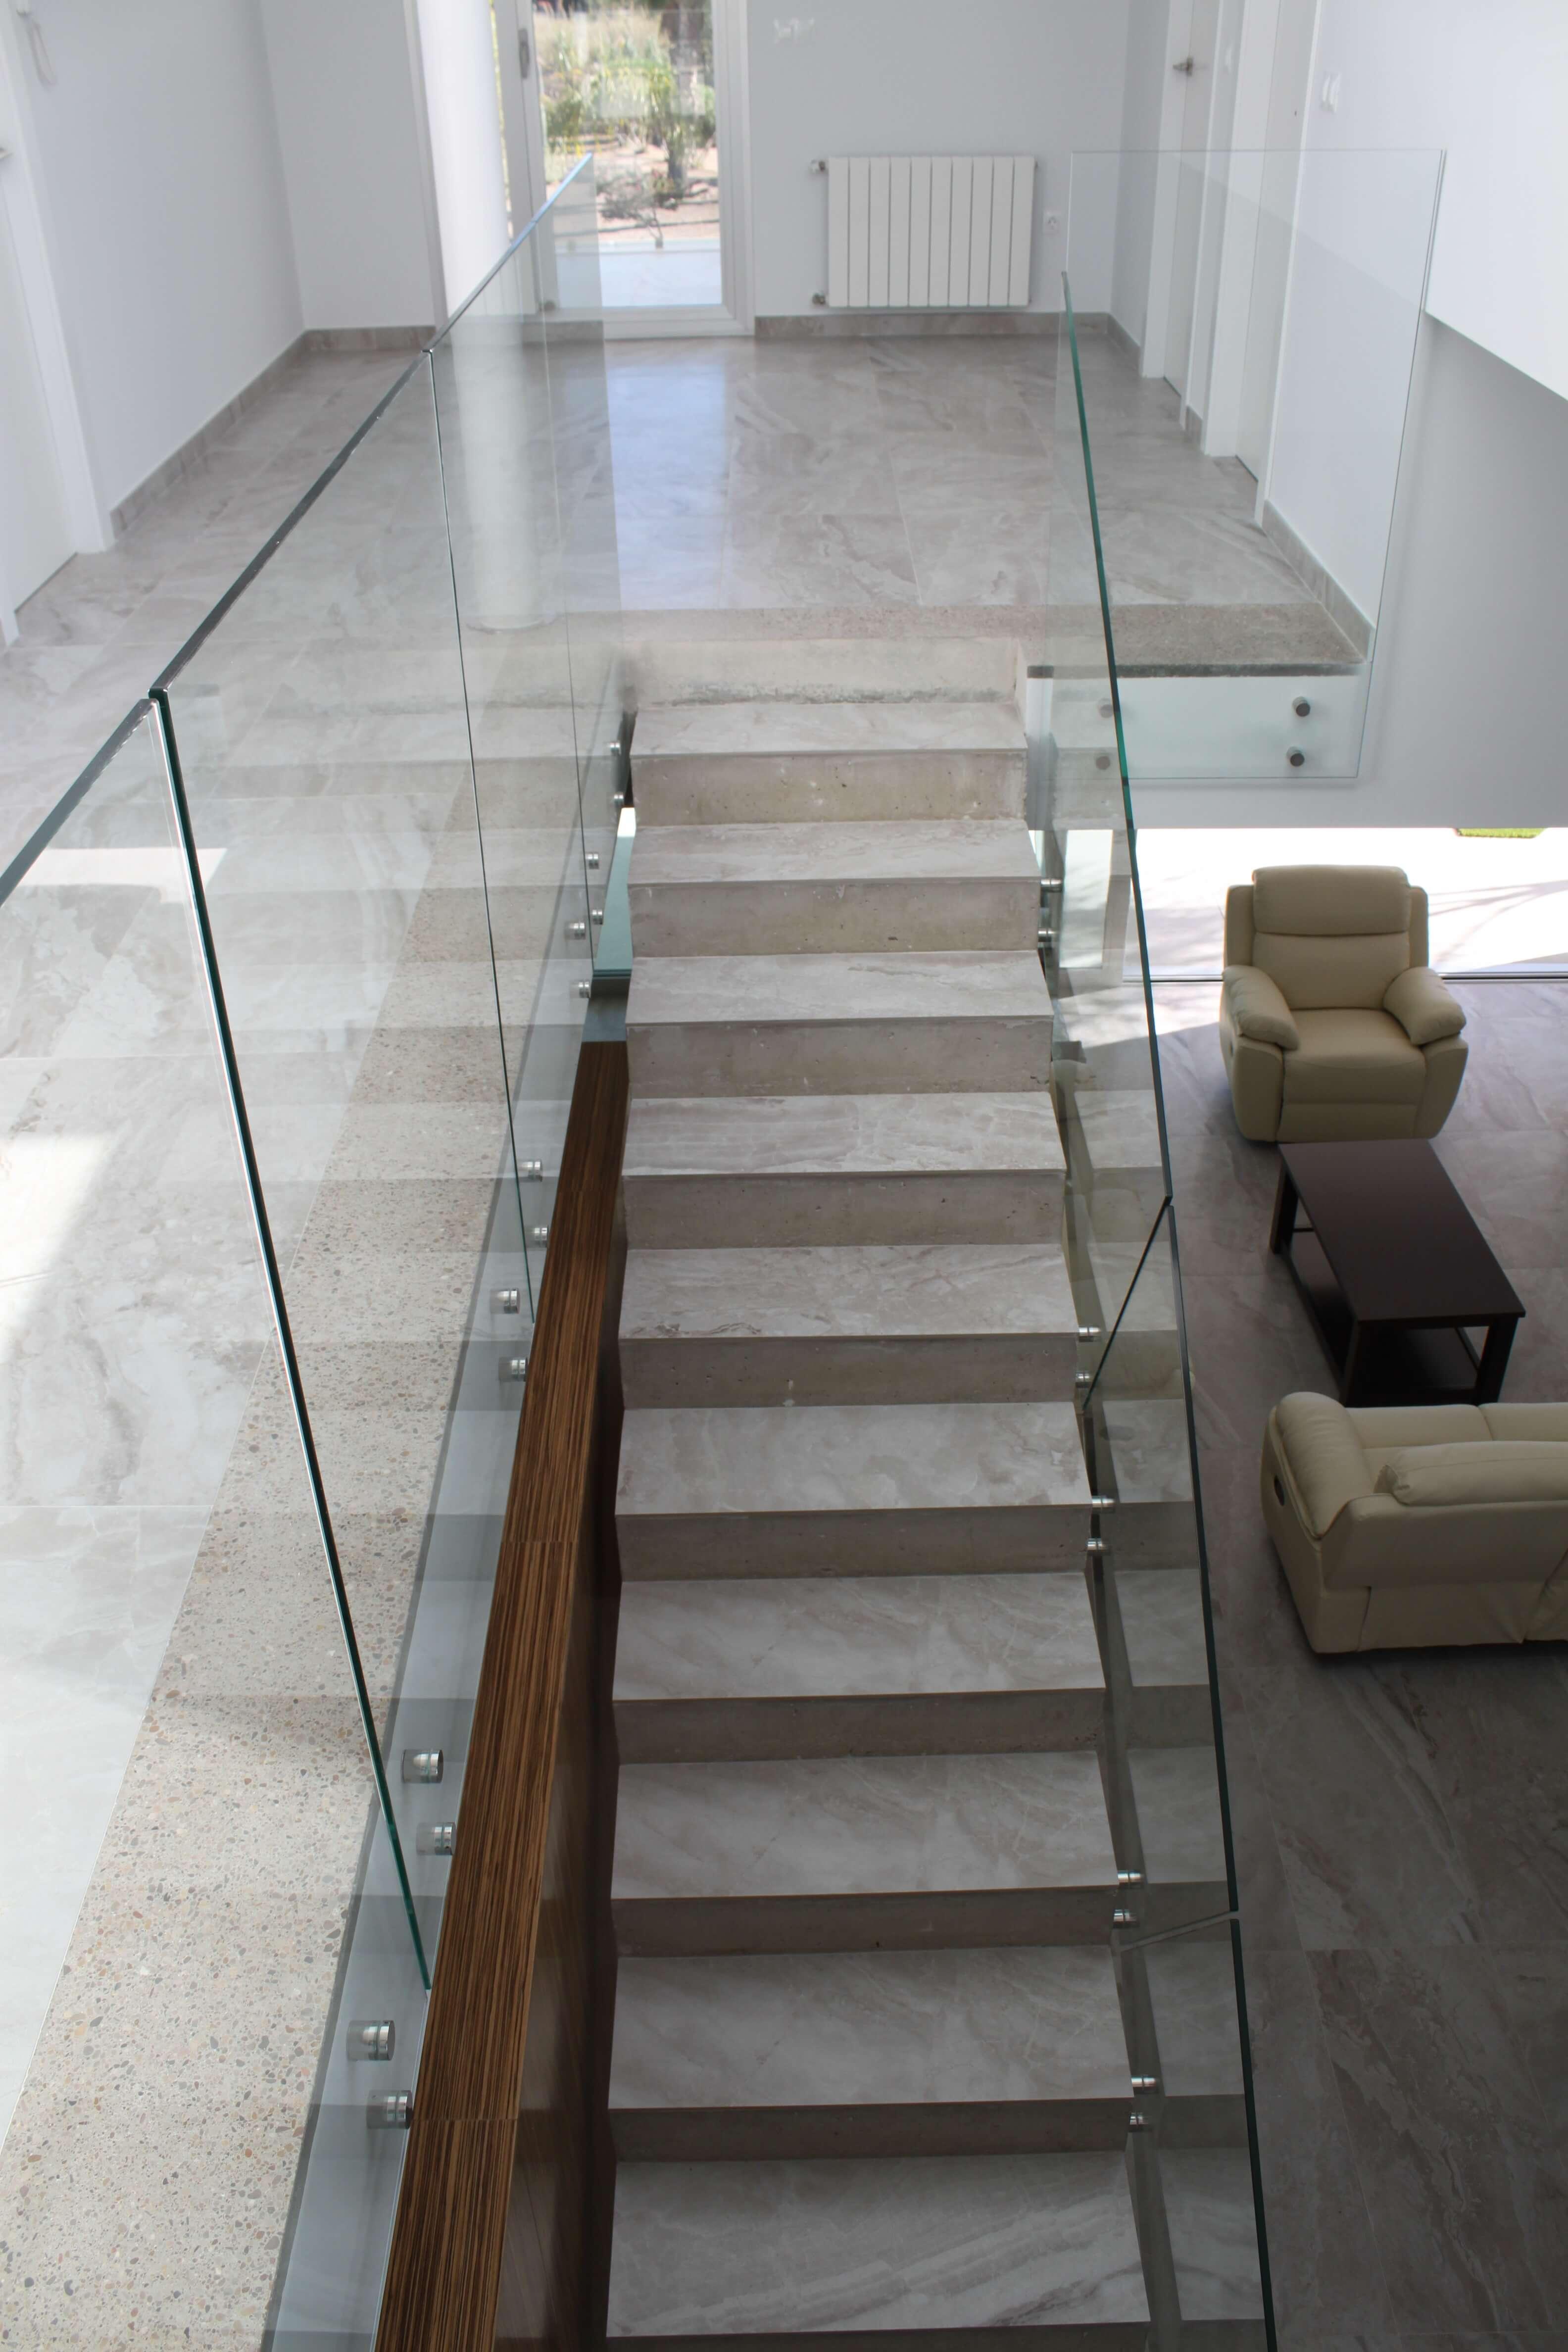 arkitech-categoria-residencial-7